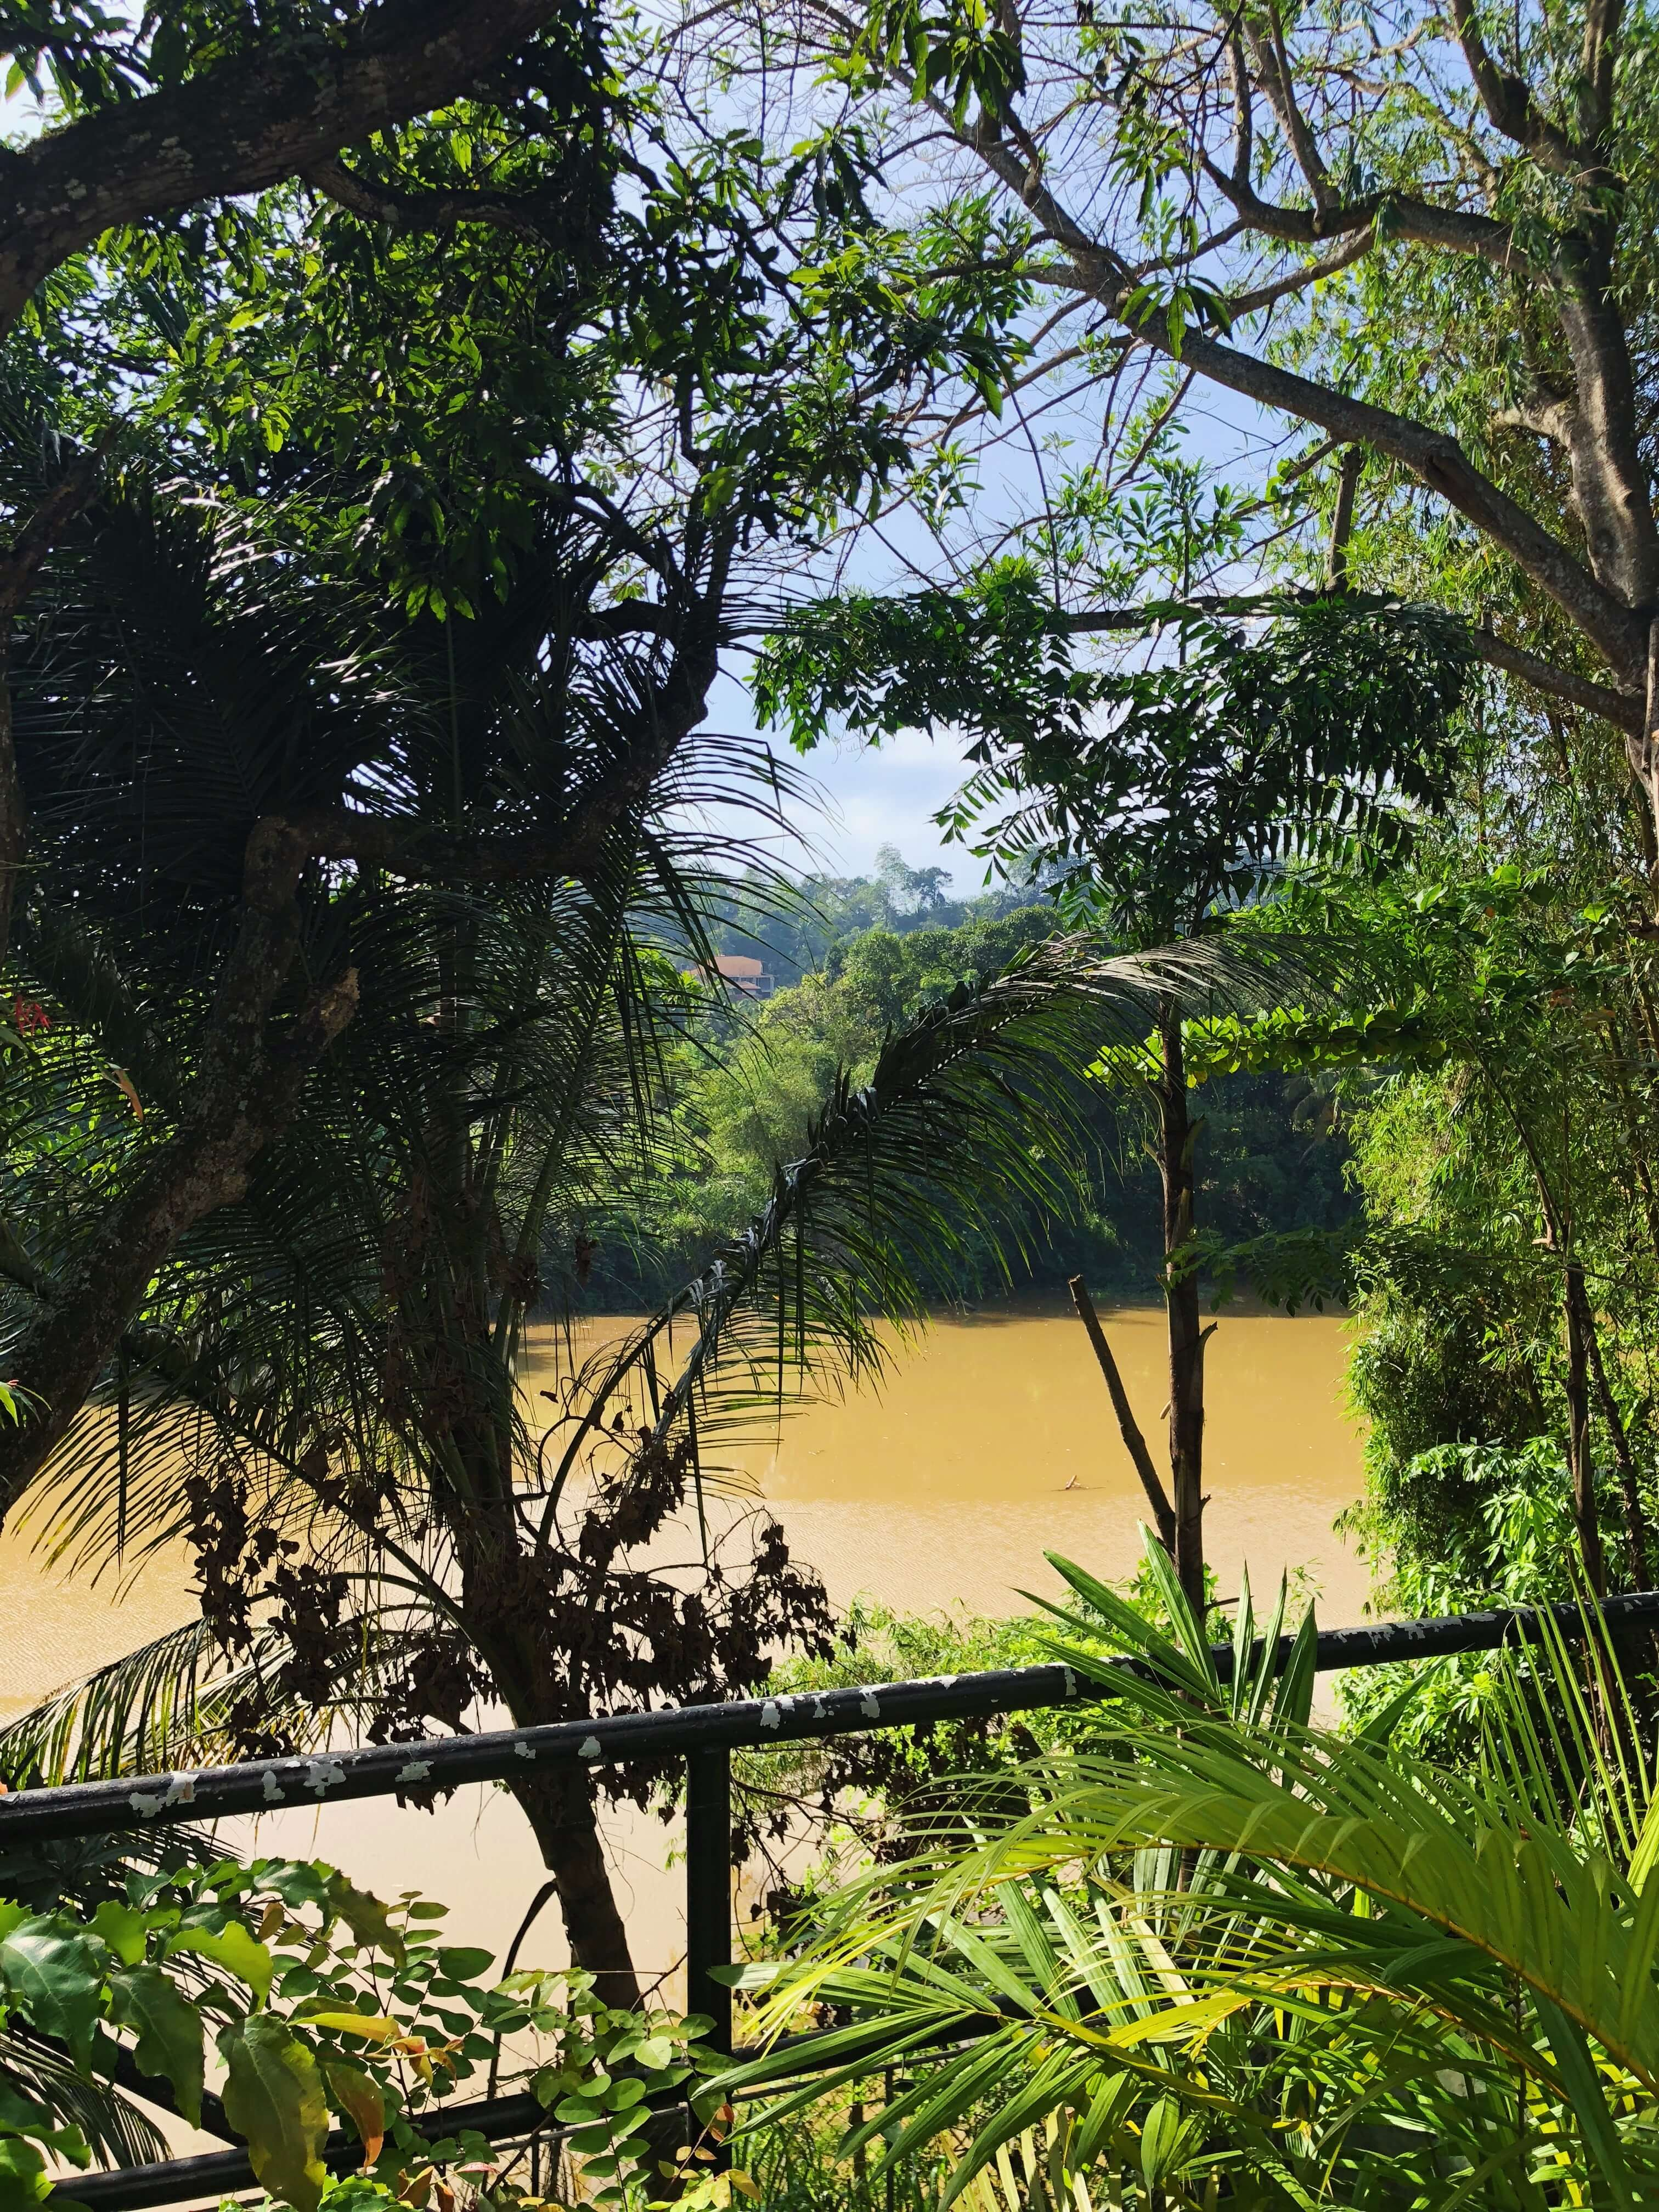 Backyard view of the Mahaweli River